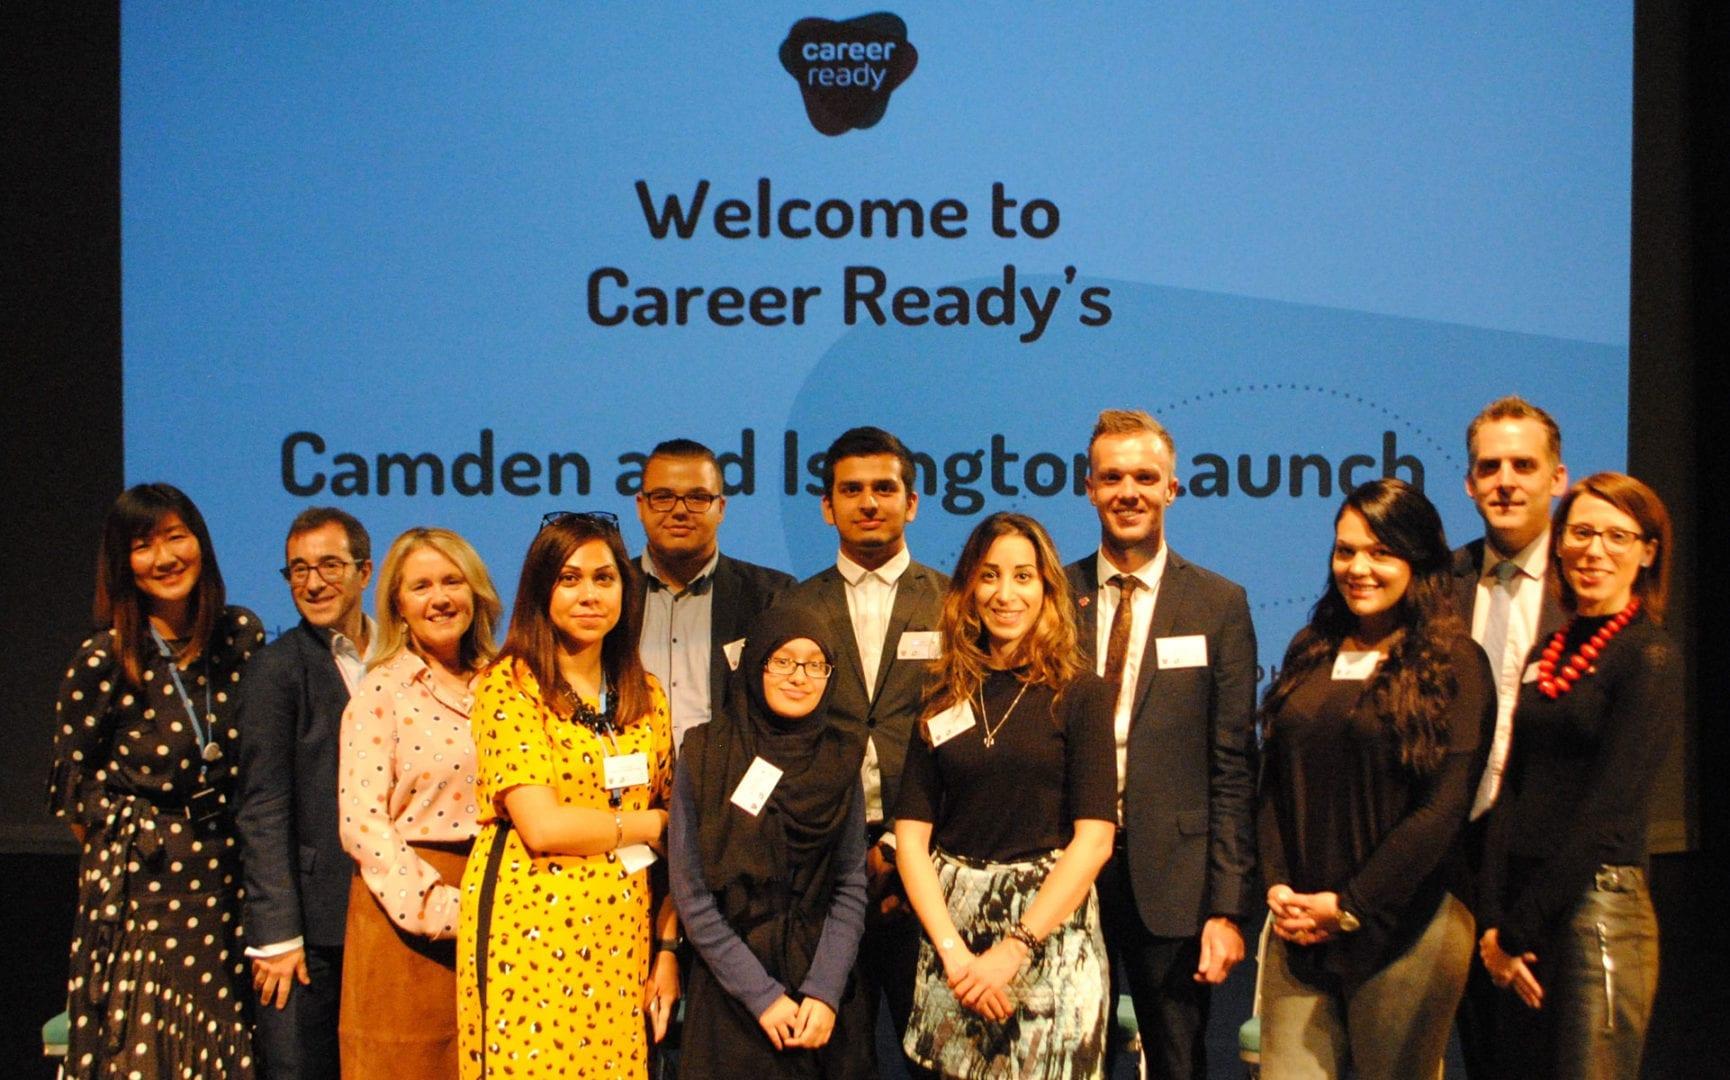 Career Ready Camden and Islington Launch